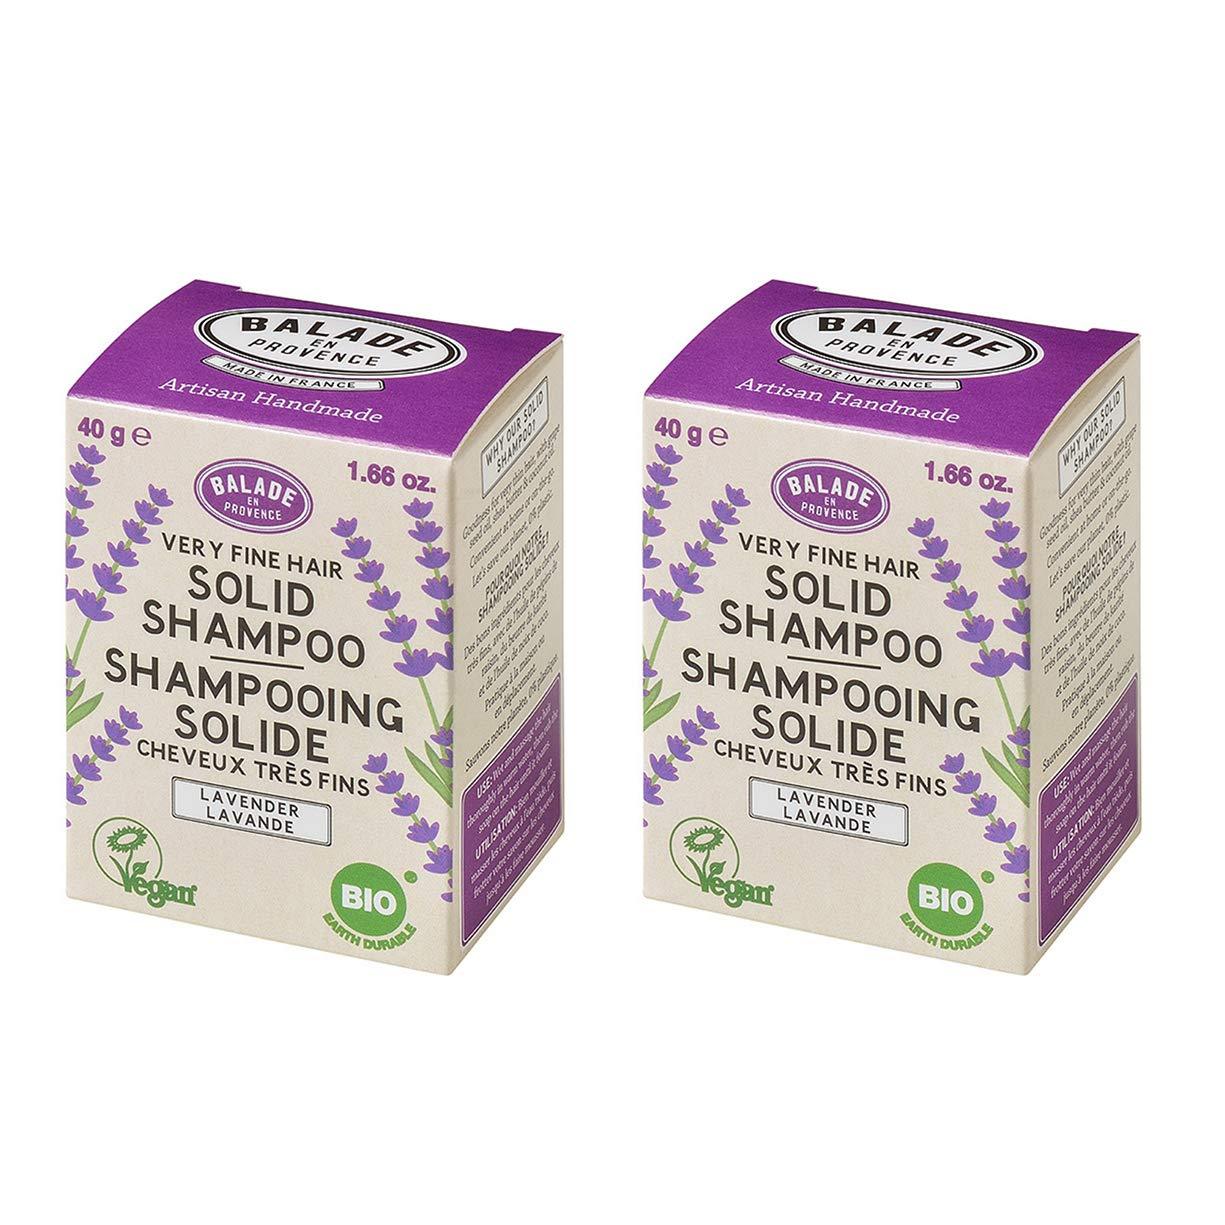 Balade En Provence Women?s Handmade Organic Solid Shampoo Bar, Lavender - Eco Friendly,Nourishing,No Sulfates,Vegan Certified,1.66 oz (Pack of 2)